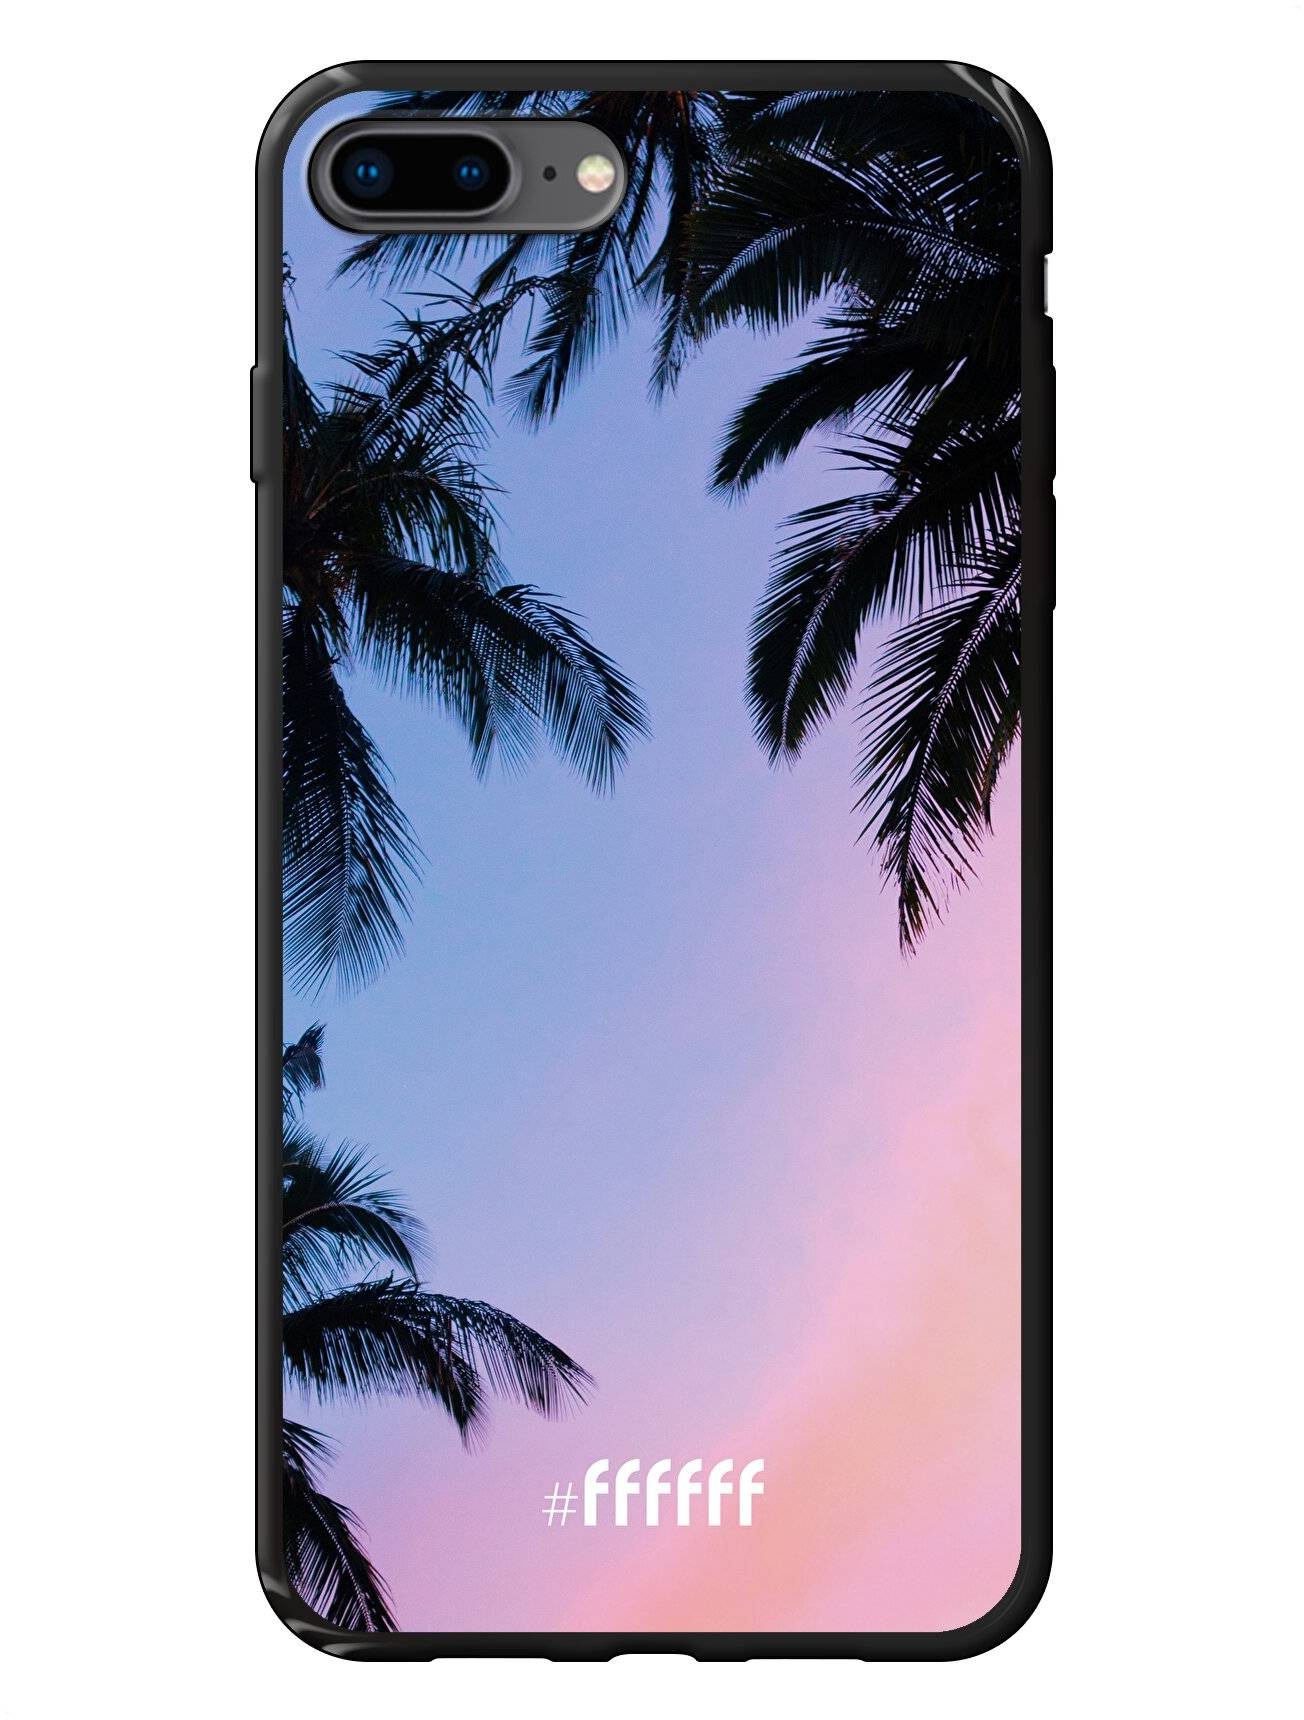 Sunset Palms iPhone 8 Plus